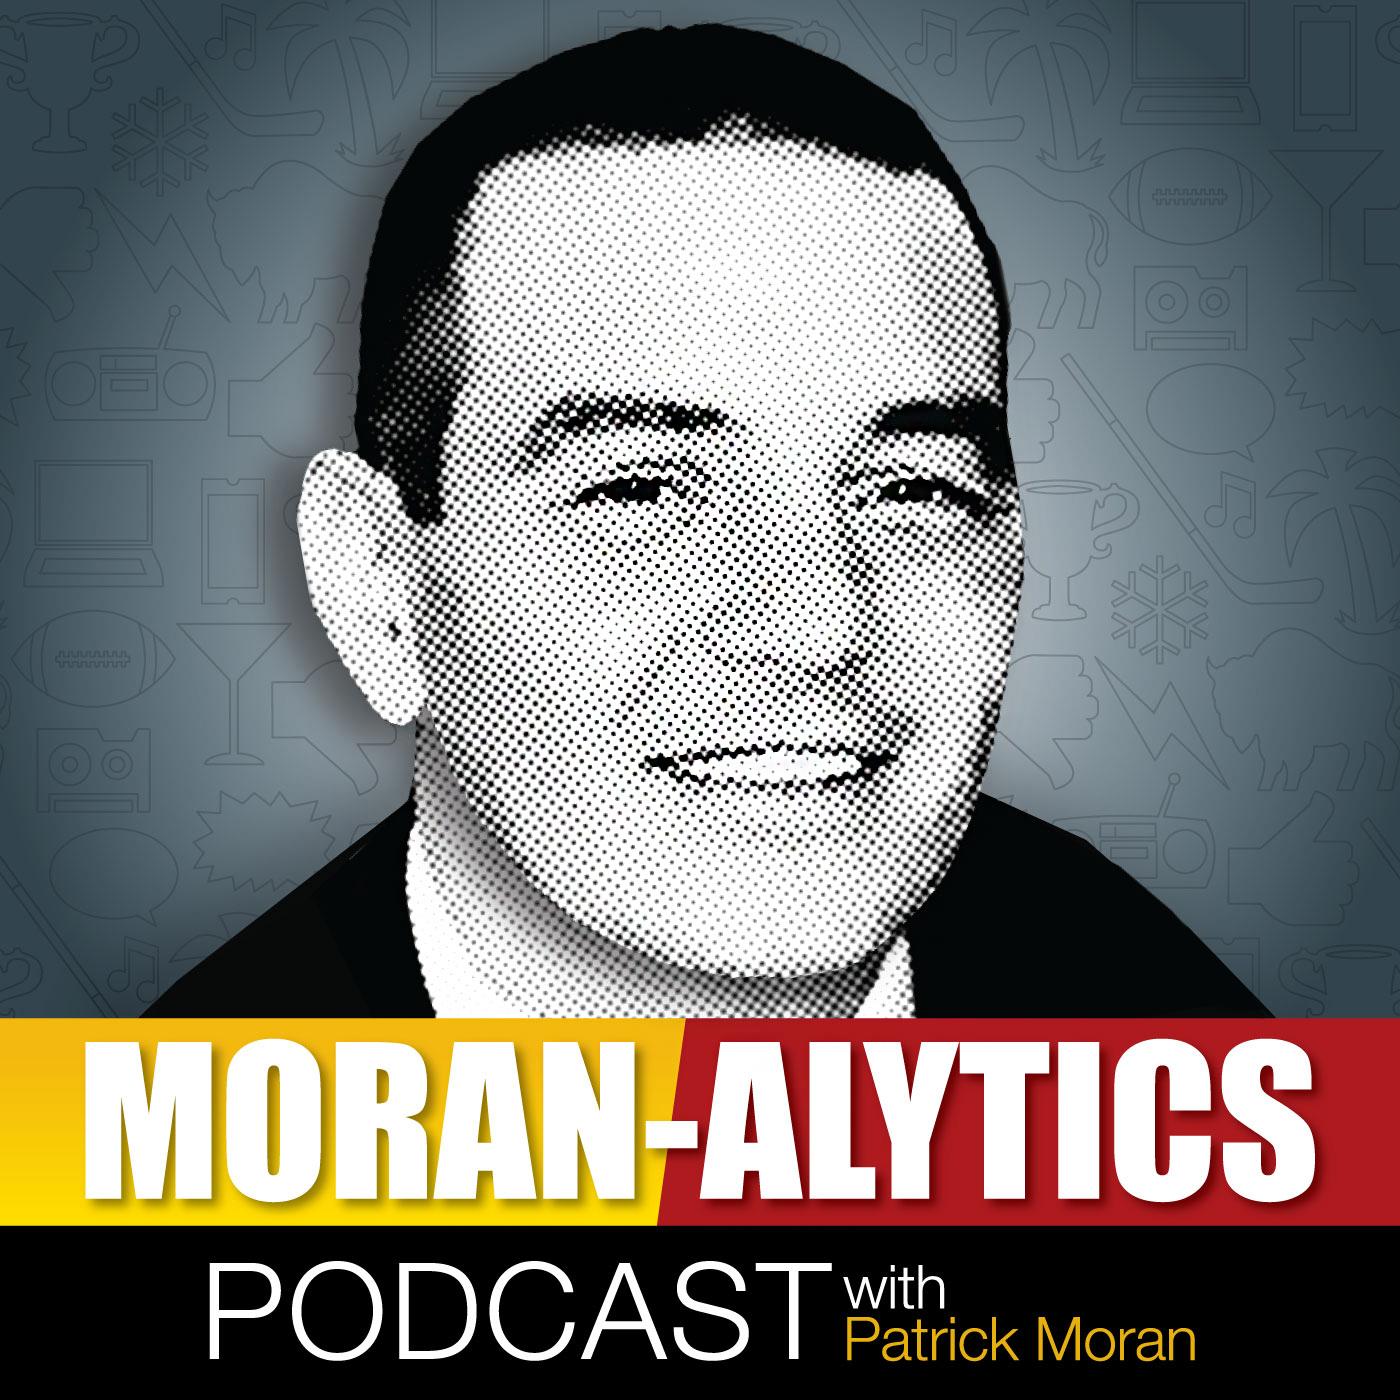 Moran-Alytics Podcast